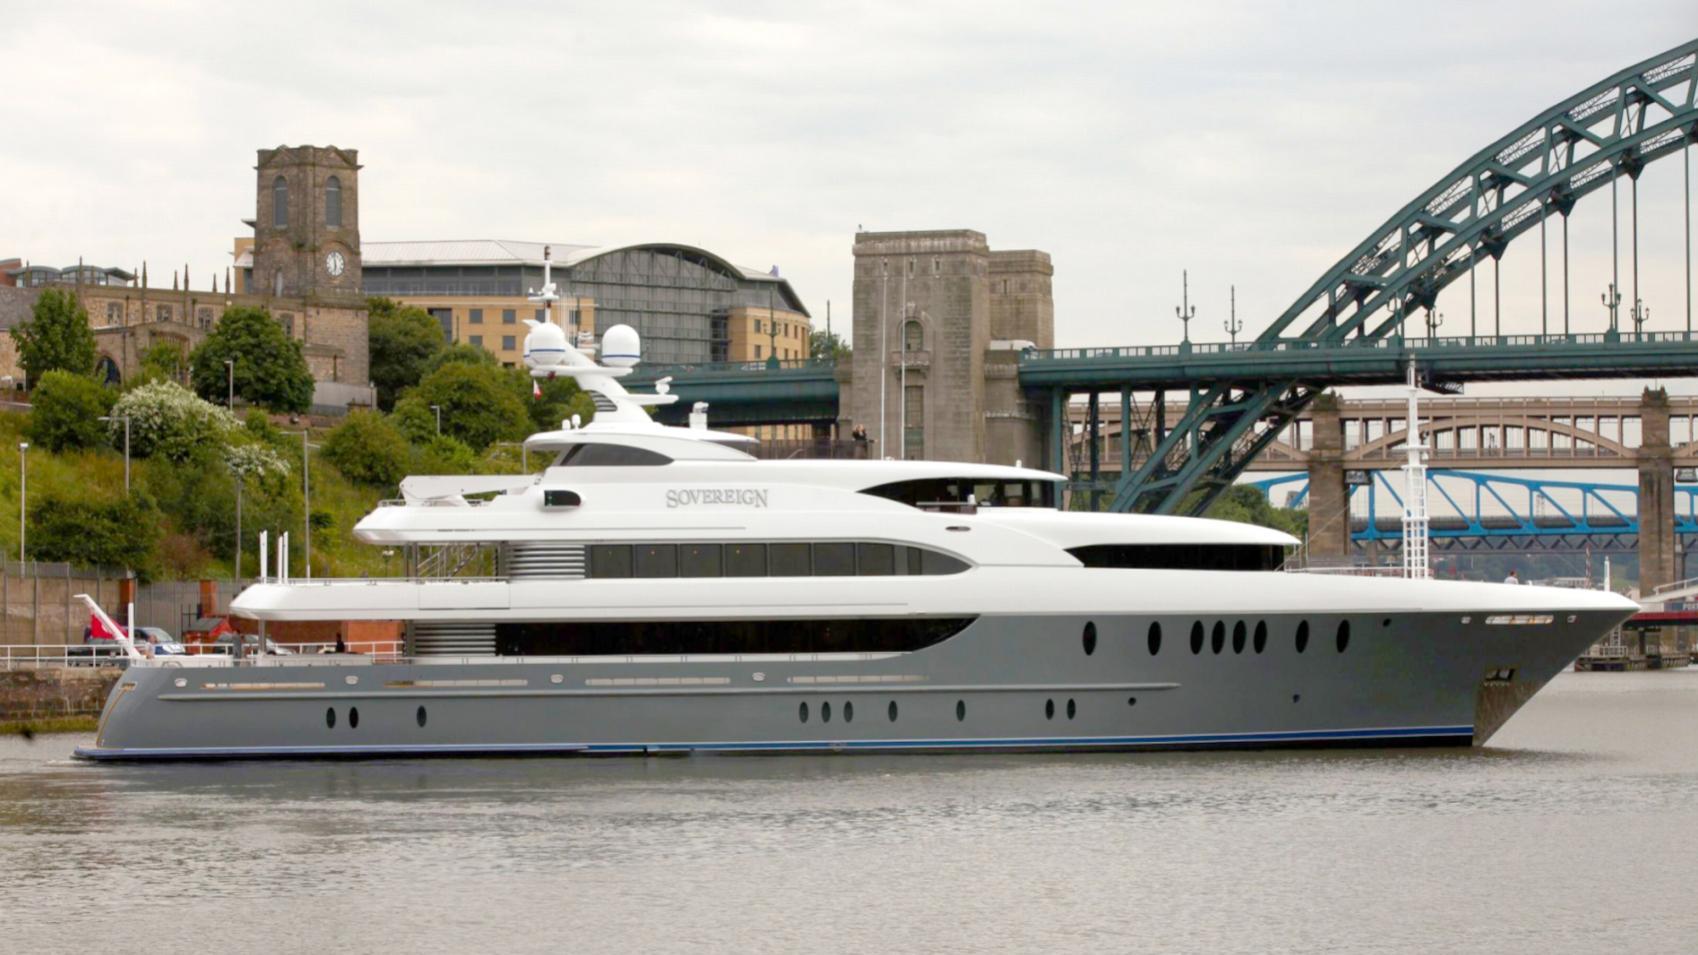 soverign motor yacht for sale main